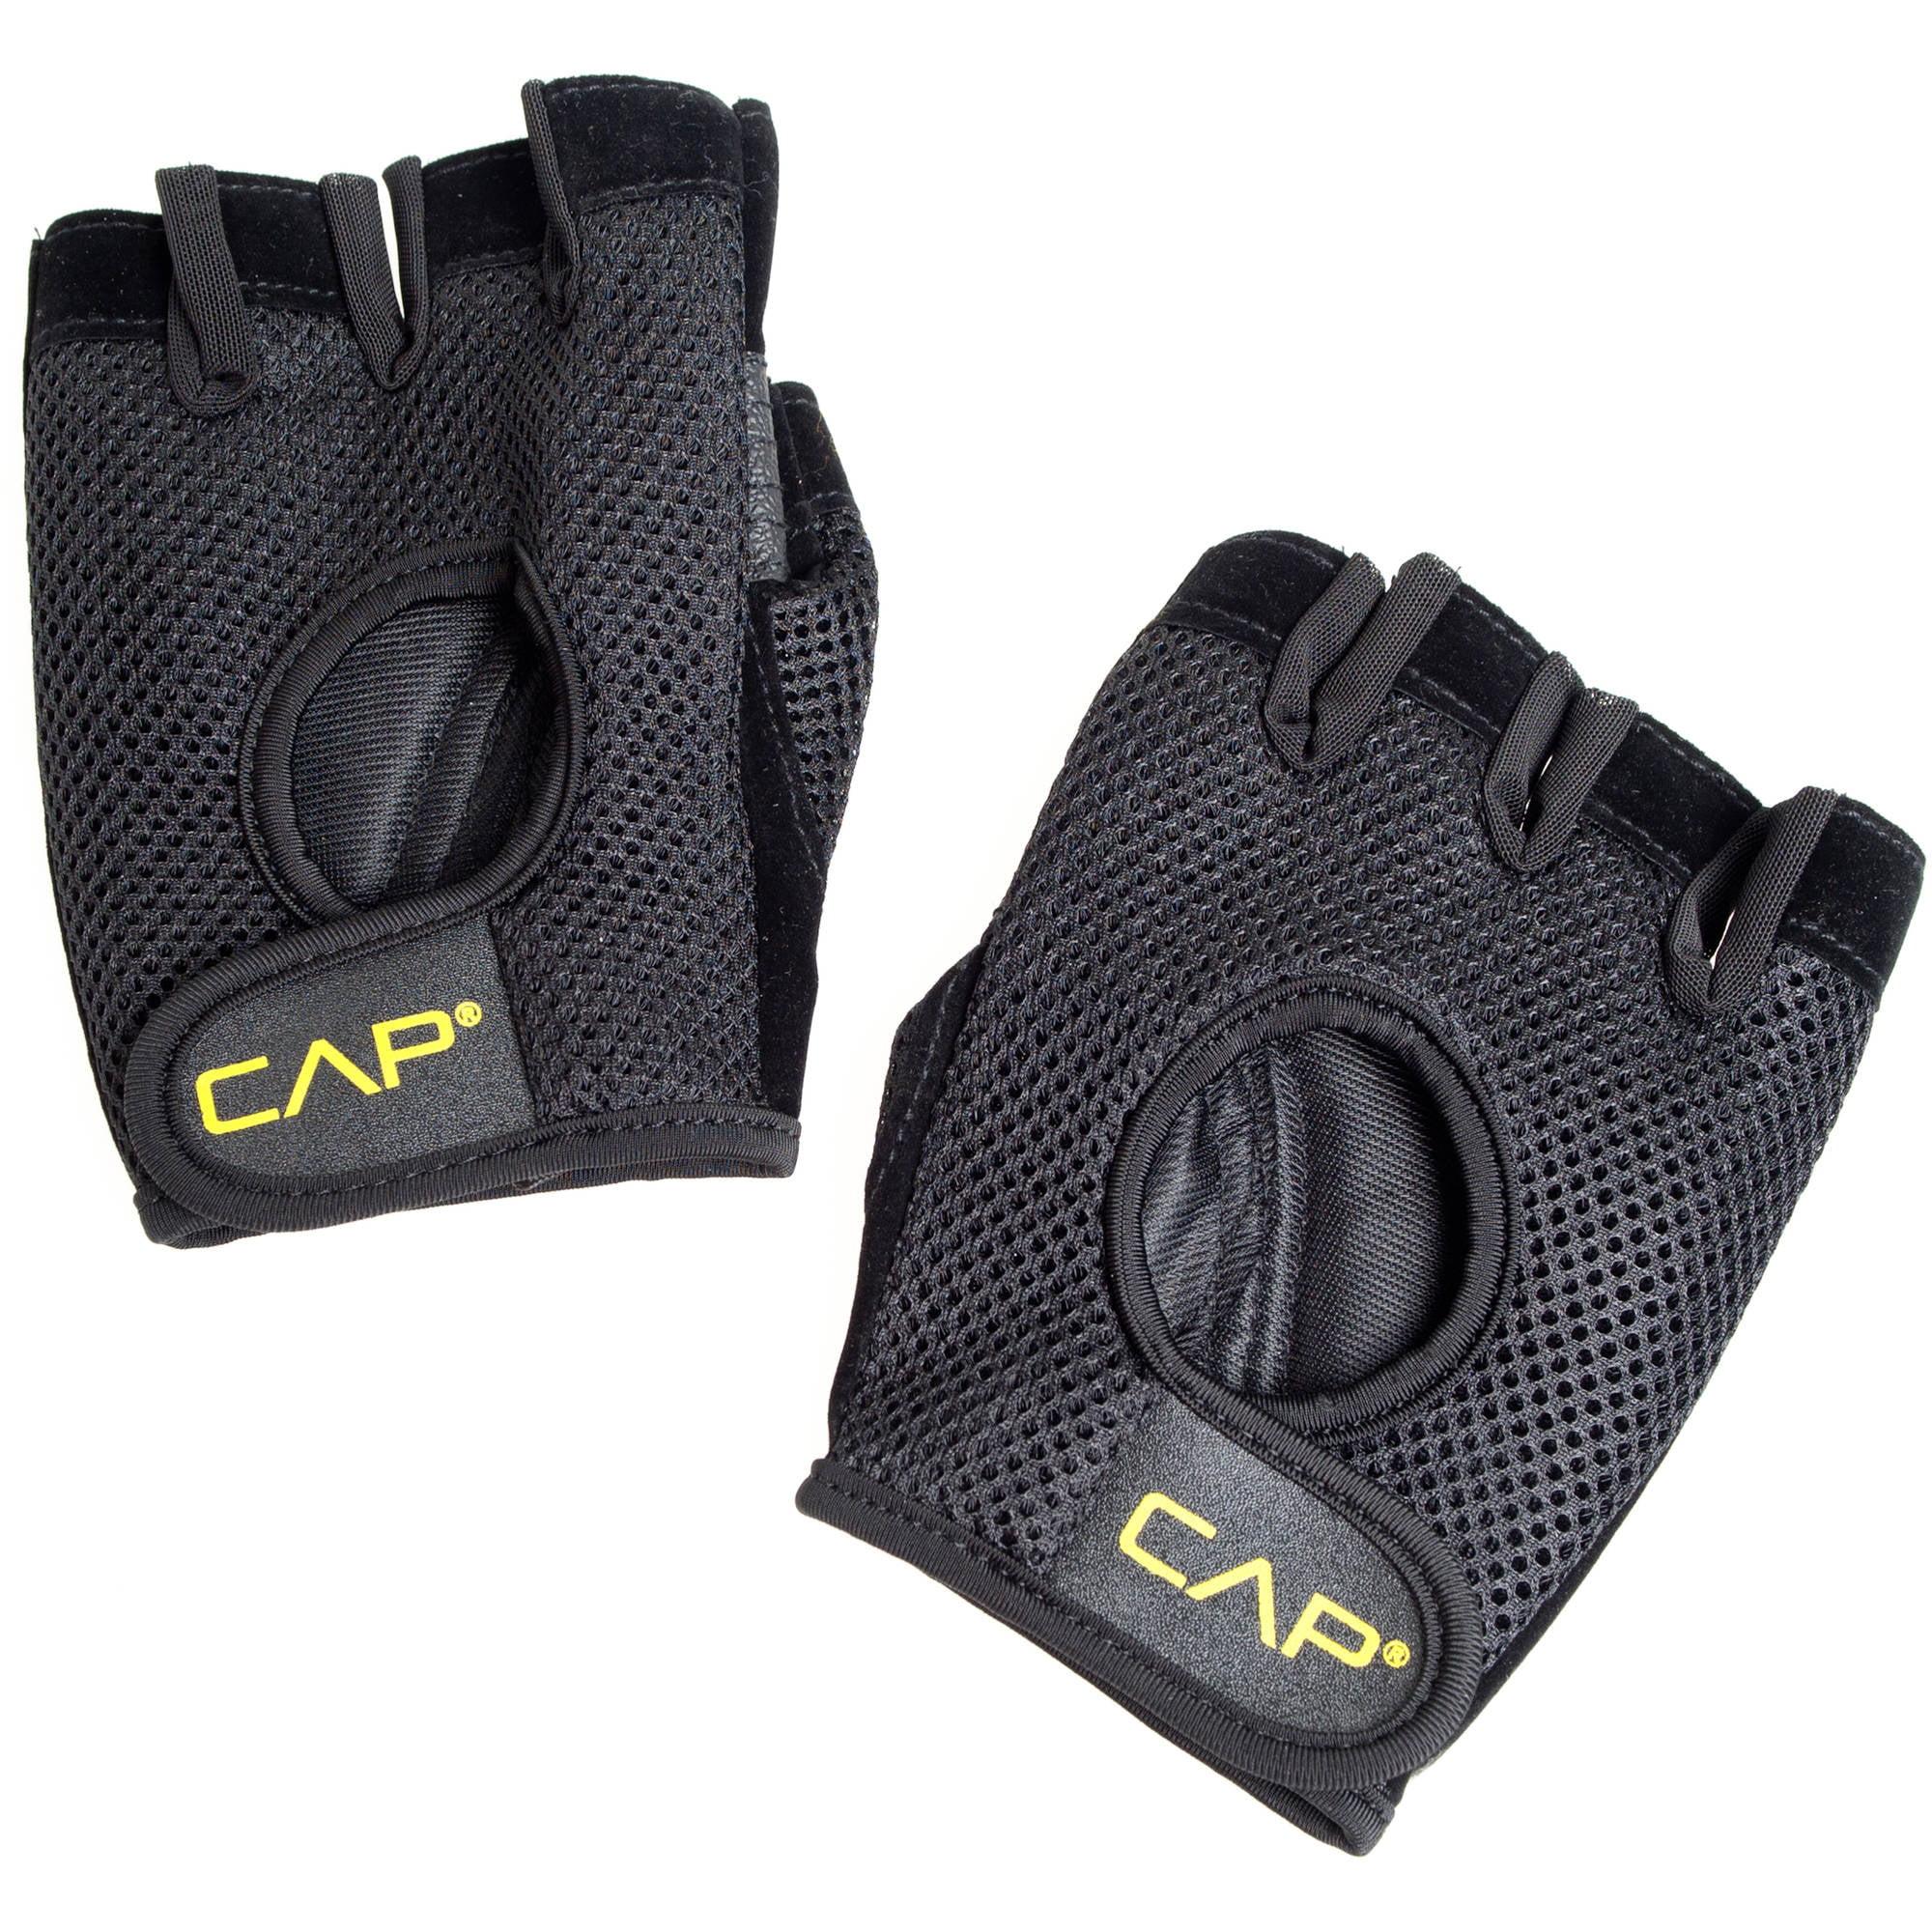 CAP Mesh Weightlifting Gloves